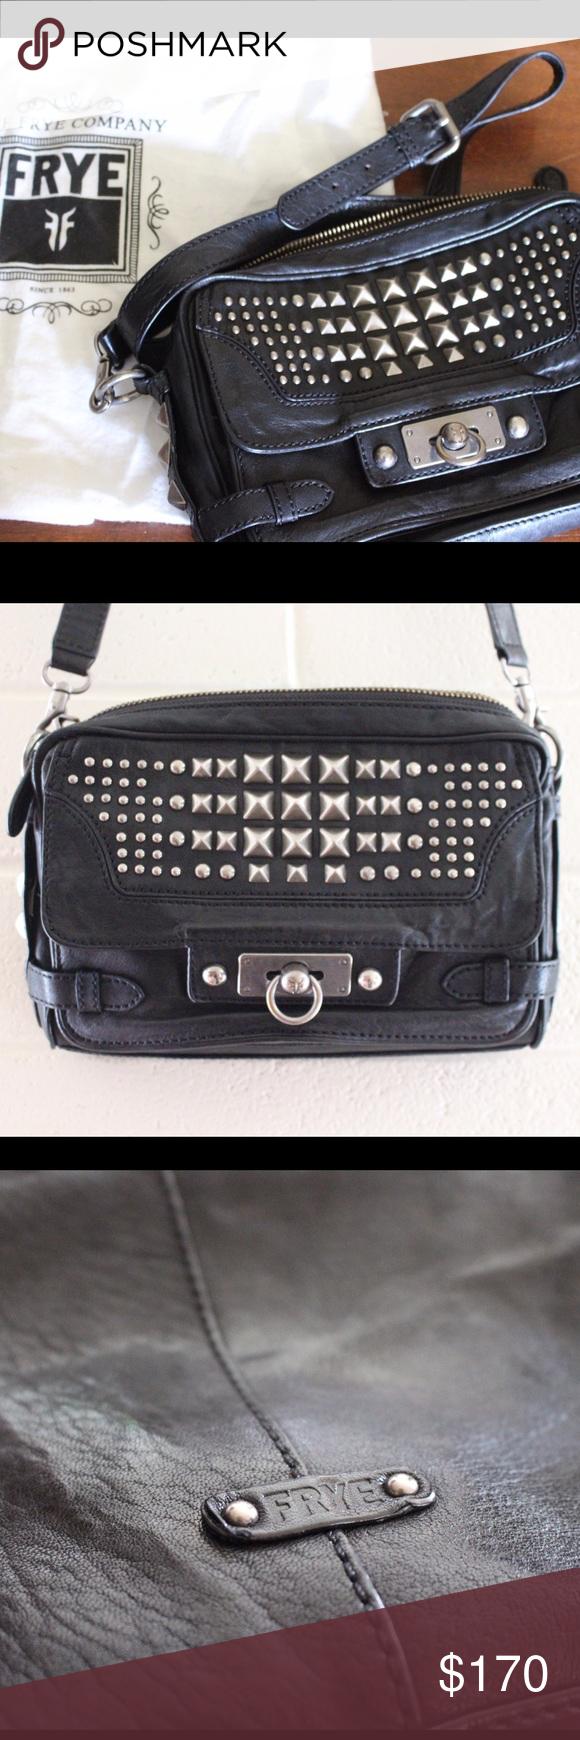 76d4b77f5860 Frye Cameron Studded Crossbody Amazing studded black leather crossbody bag.  Edgy statement piece that goes